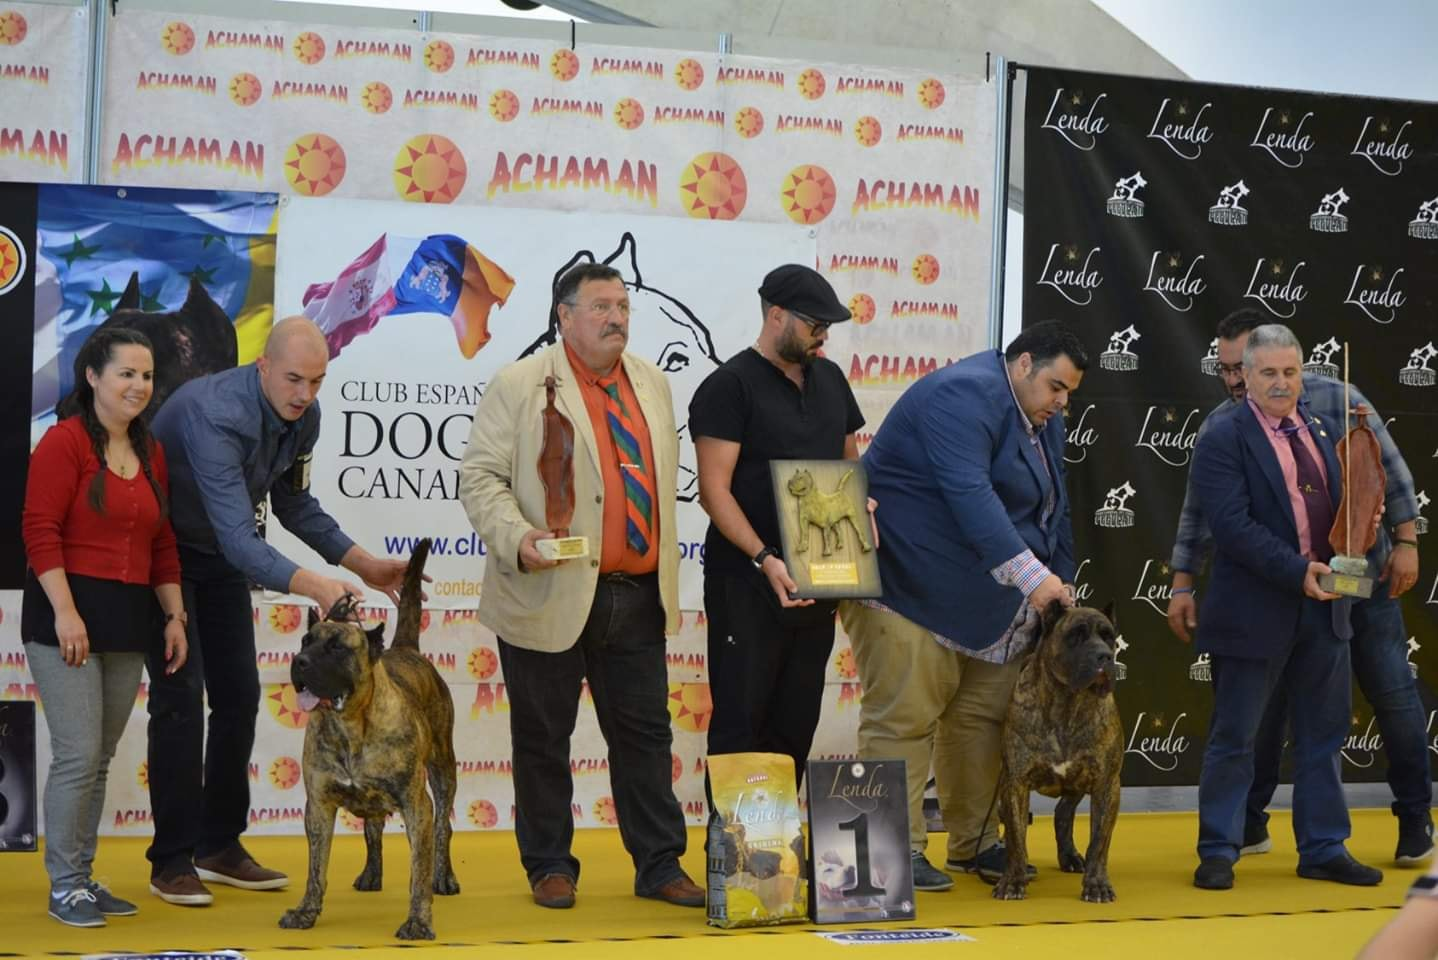 27 Monografica of Dogo – Presa Canario, Tenerife, Canary Islands 2018